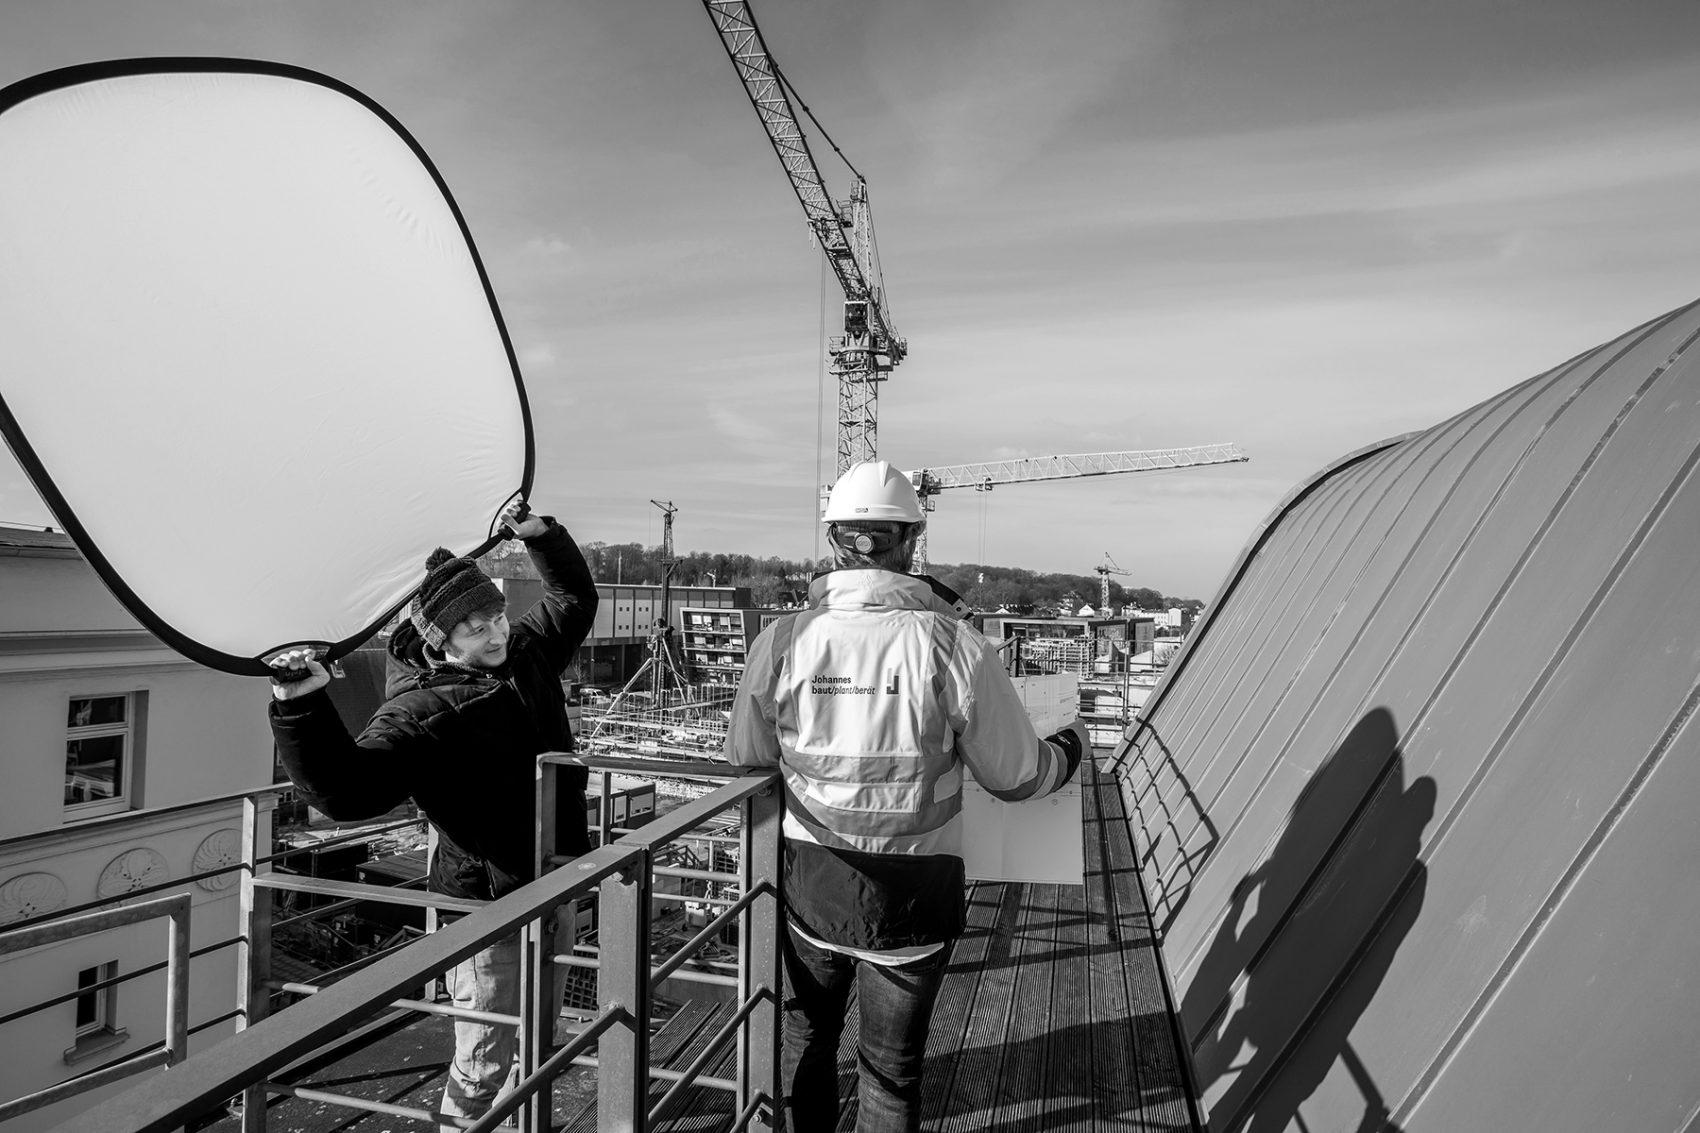 Bauunternehmen Willy Johannes Bau GmbH & Co. KG